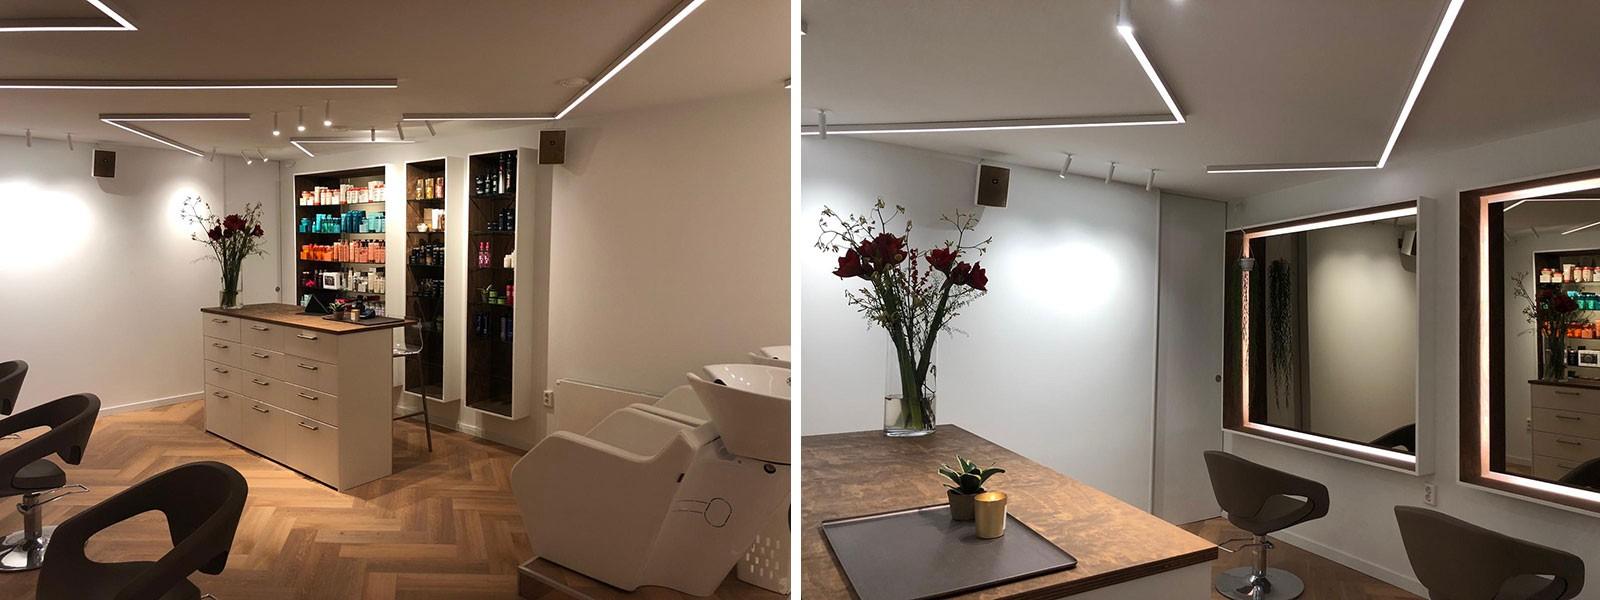 D01 Salon, Amsterdam